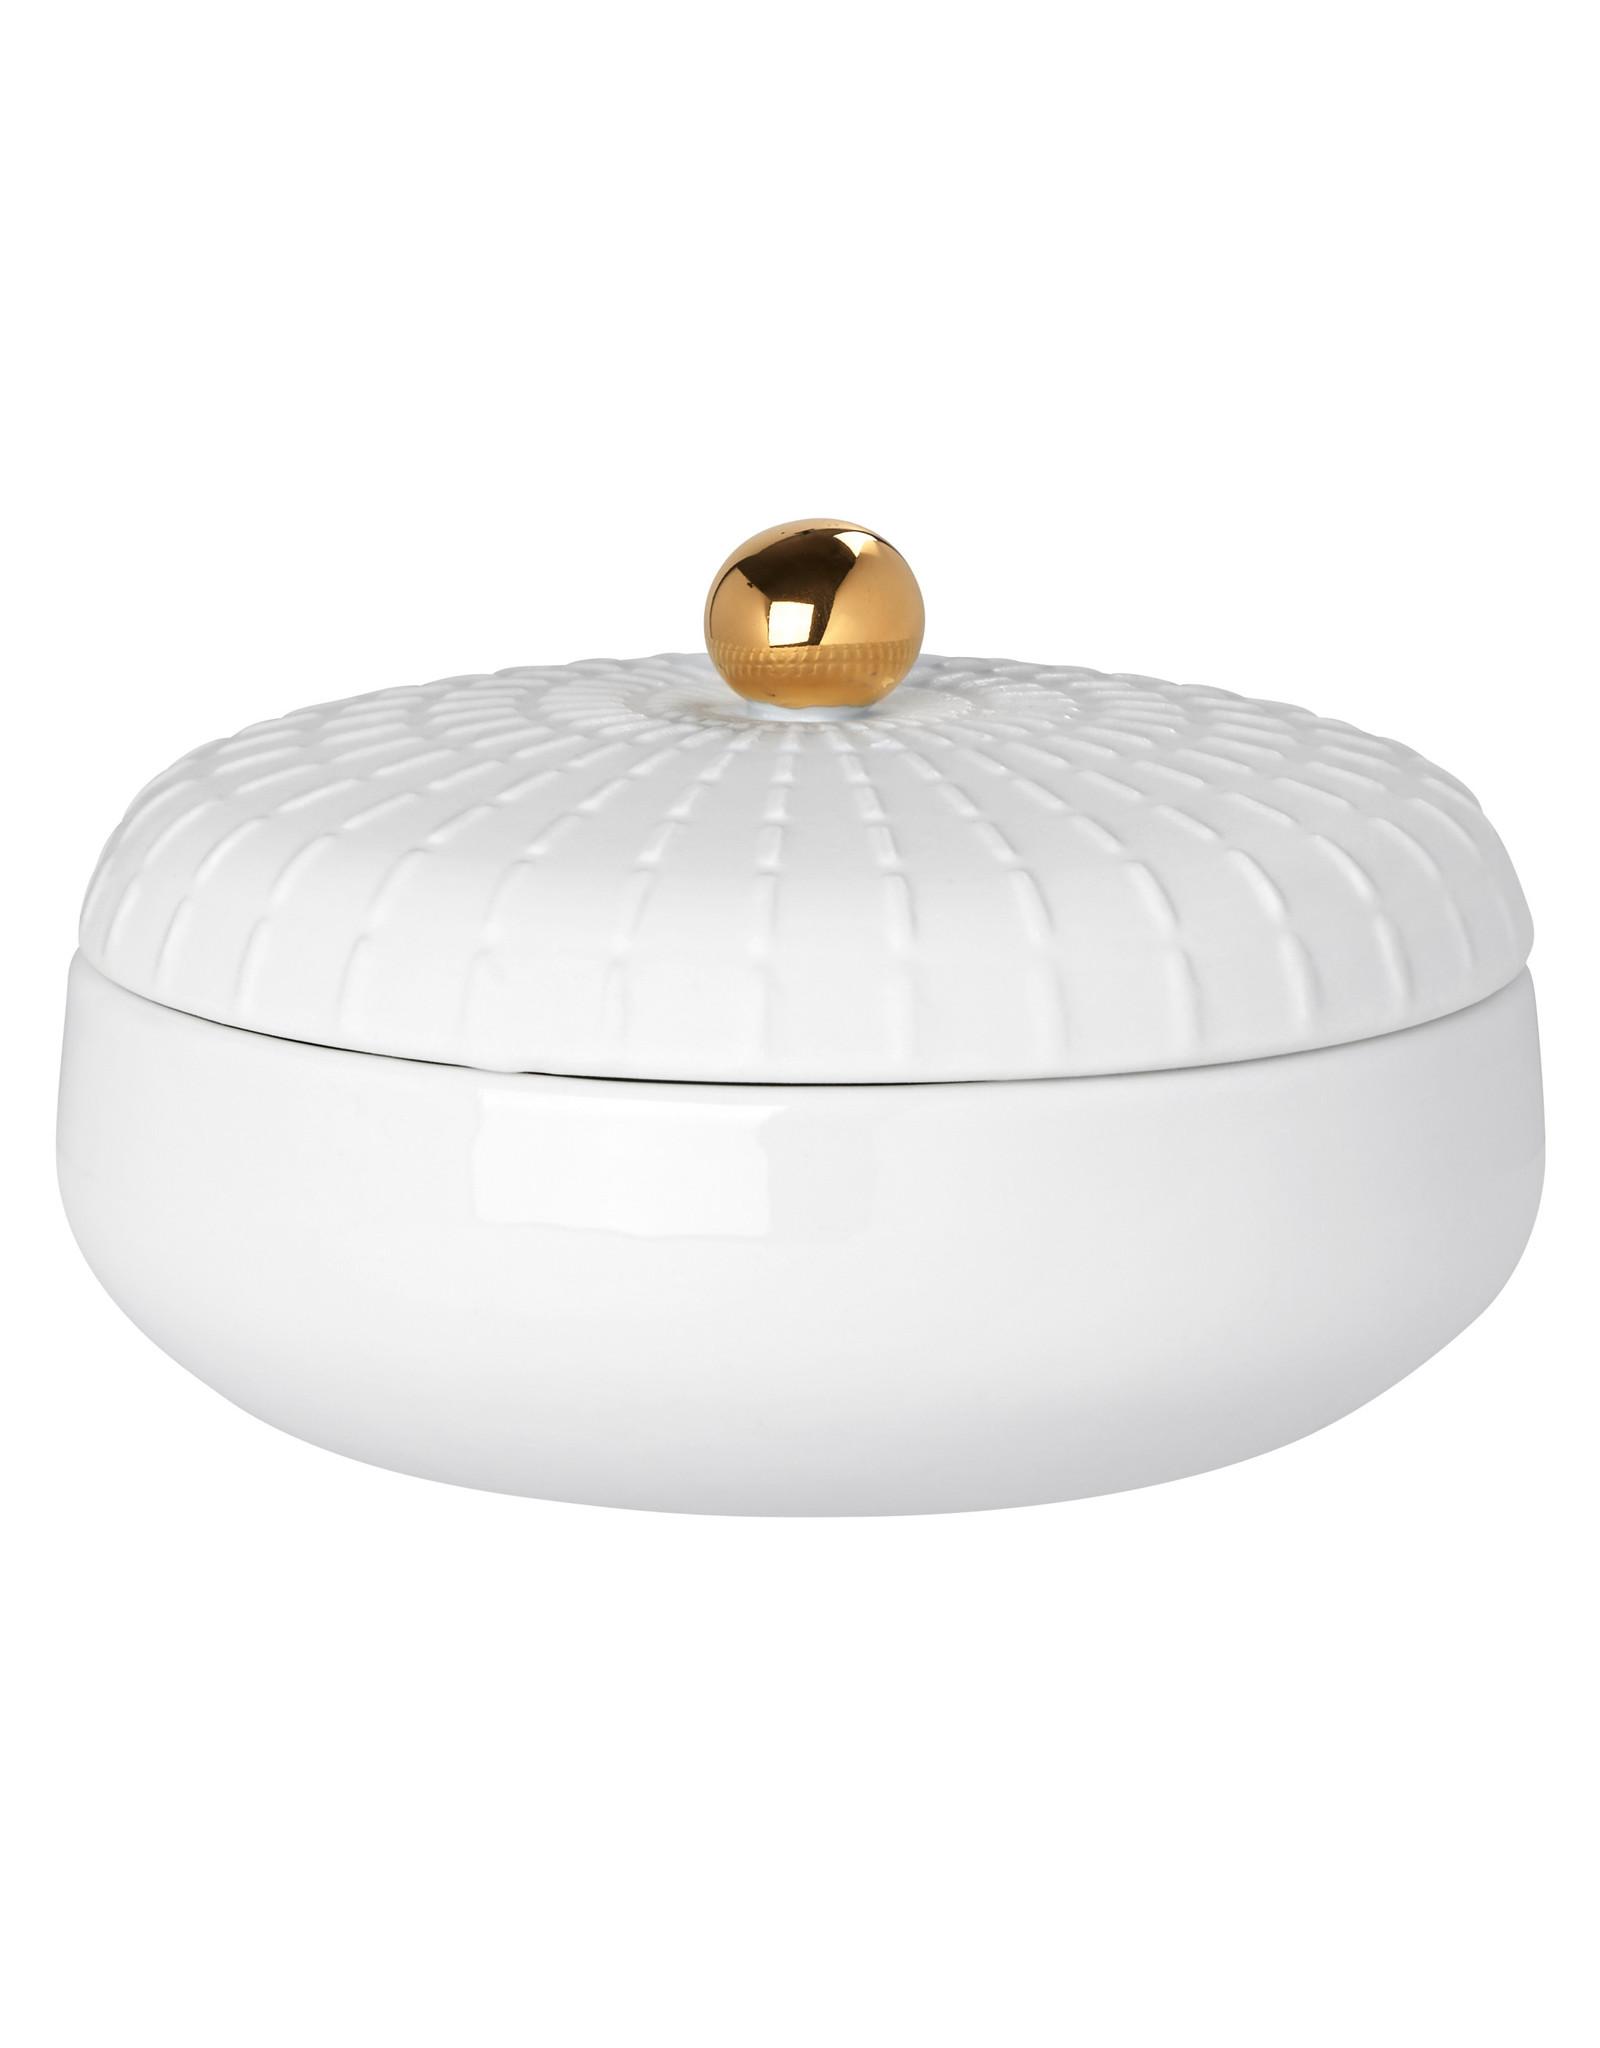 Raeder Potje met deksel wit/ gouden bol L dia:9,5cm Height:6cm